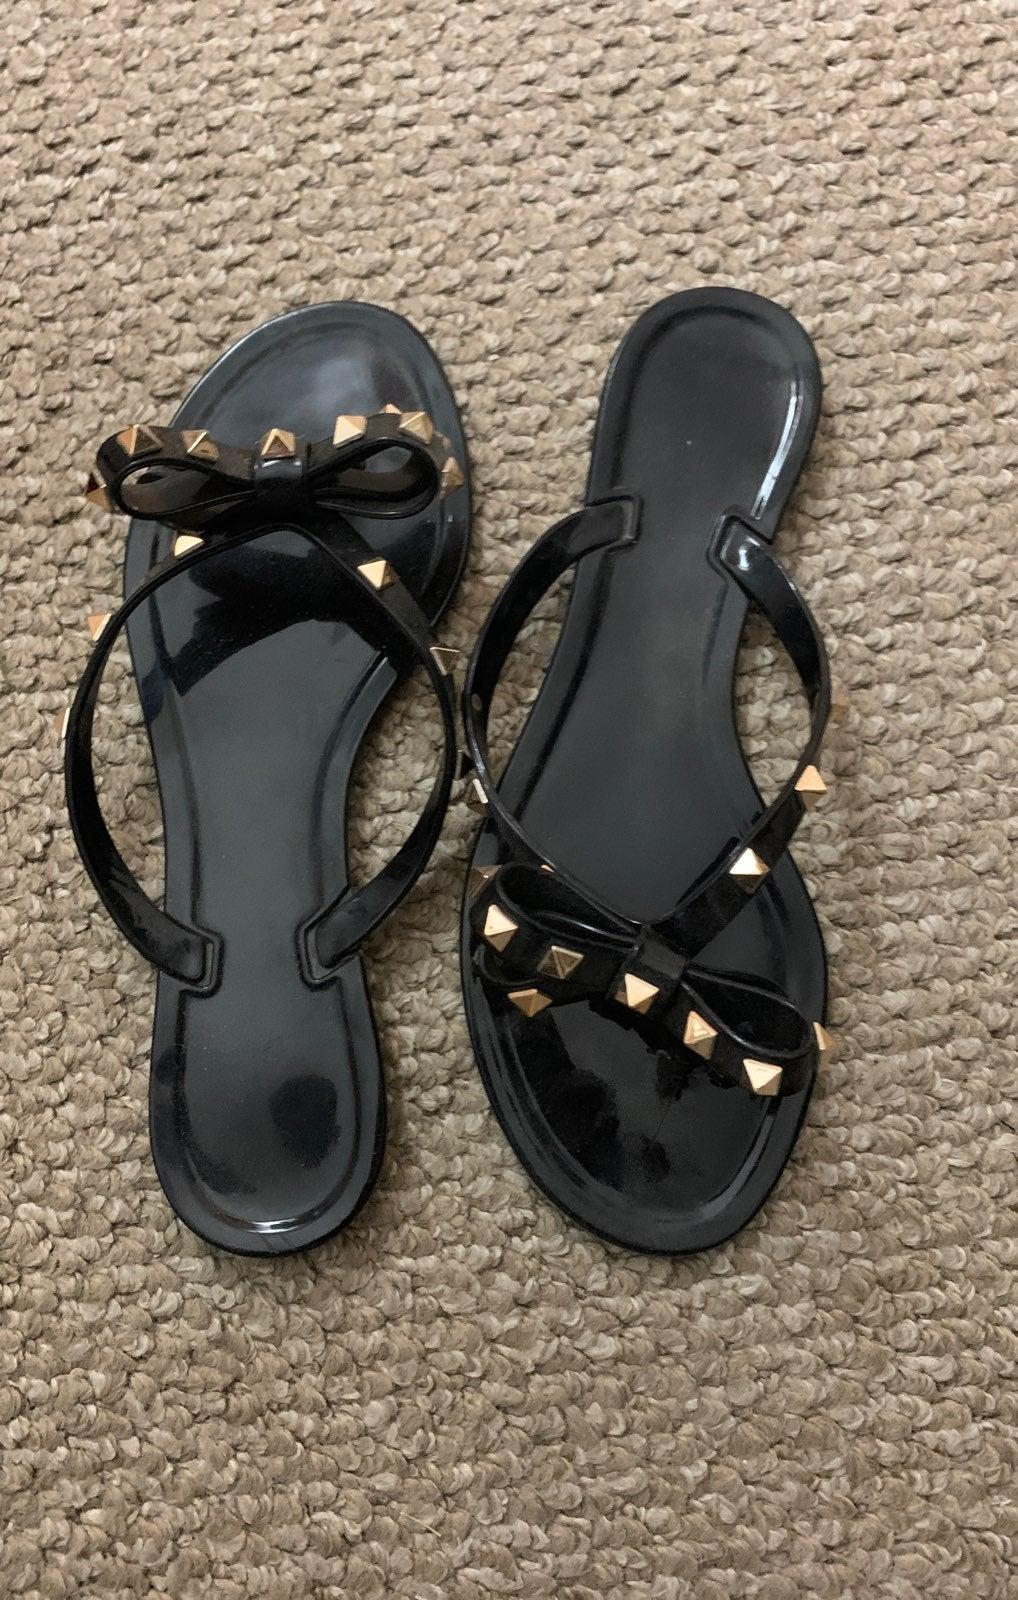 NWOT size 8 gold studded Sandals